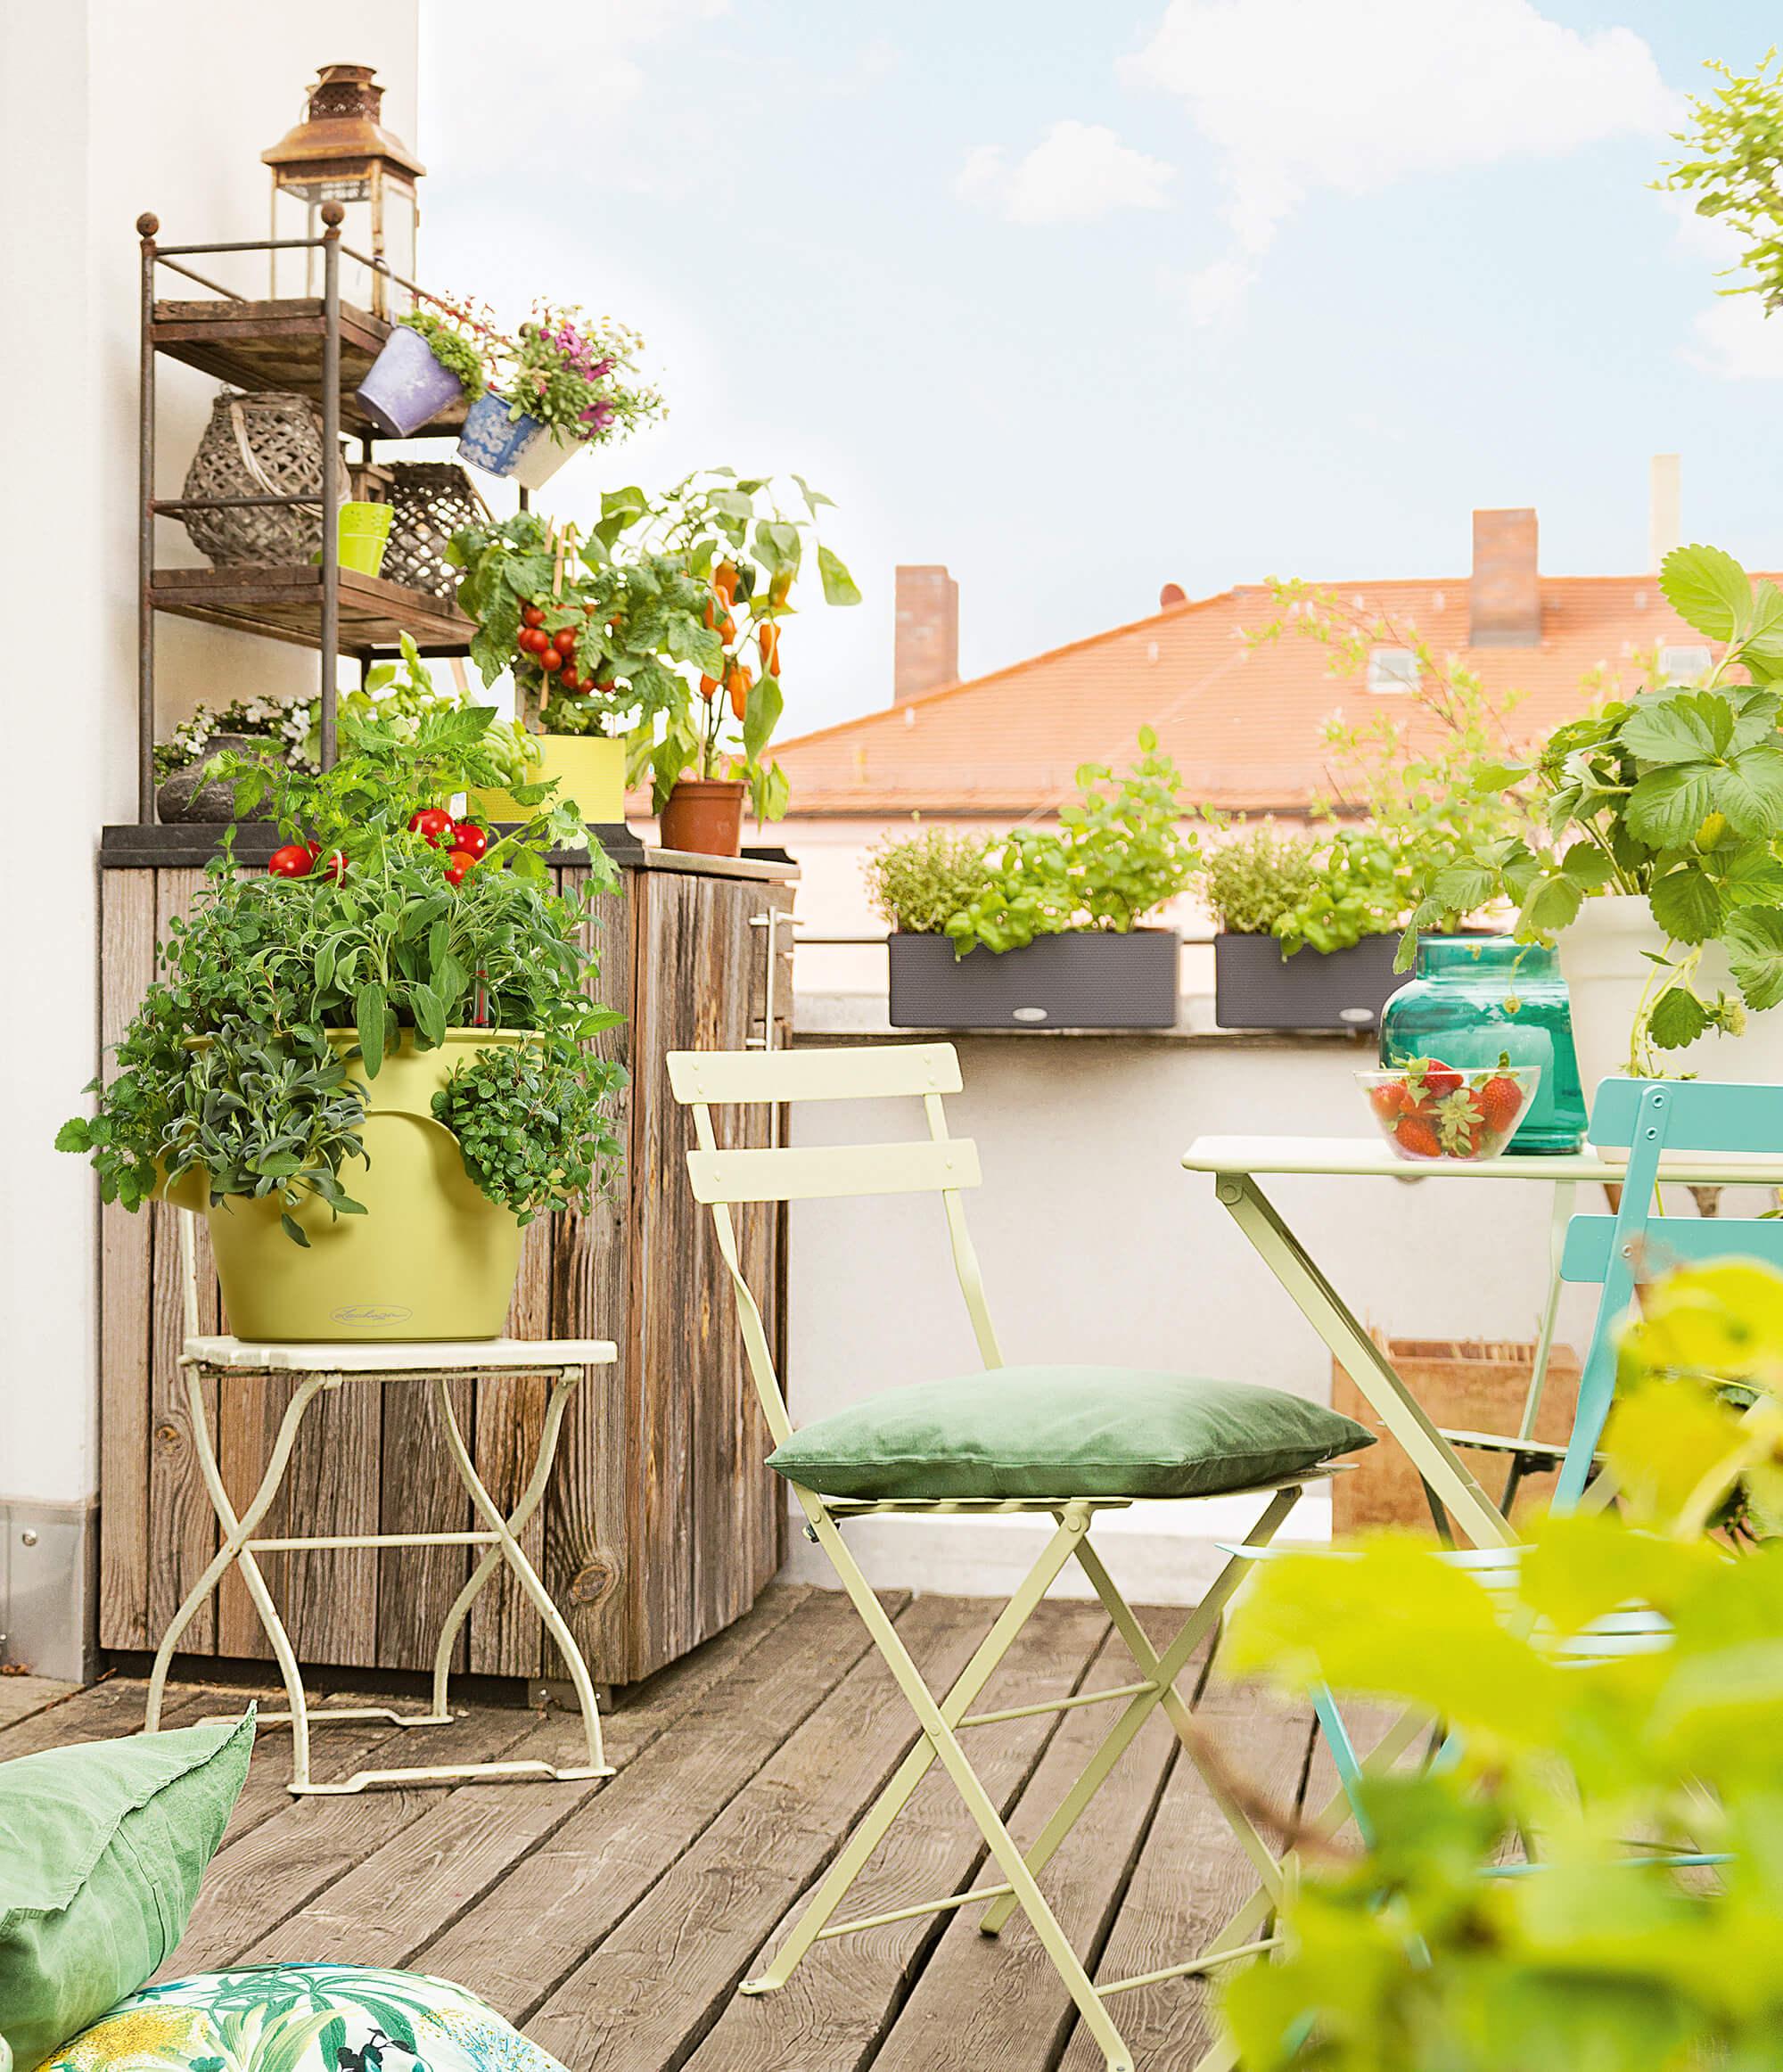 le_tw-urban-gardening_cascadino_gruen.png